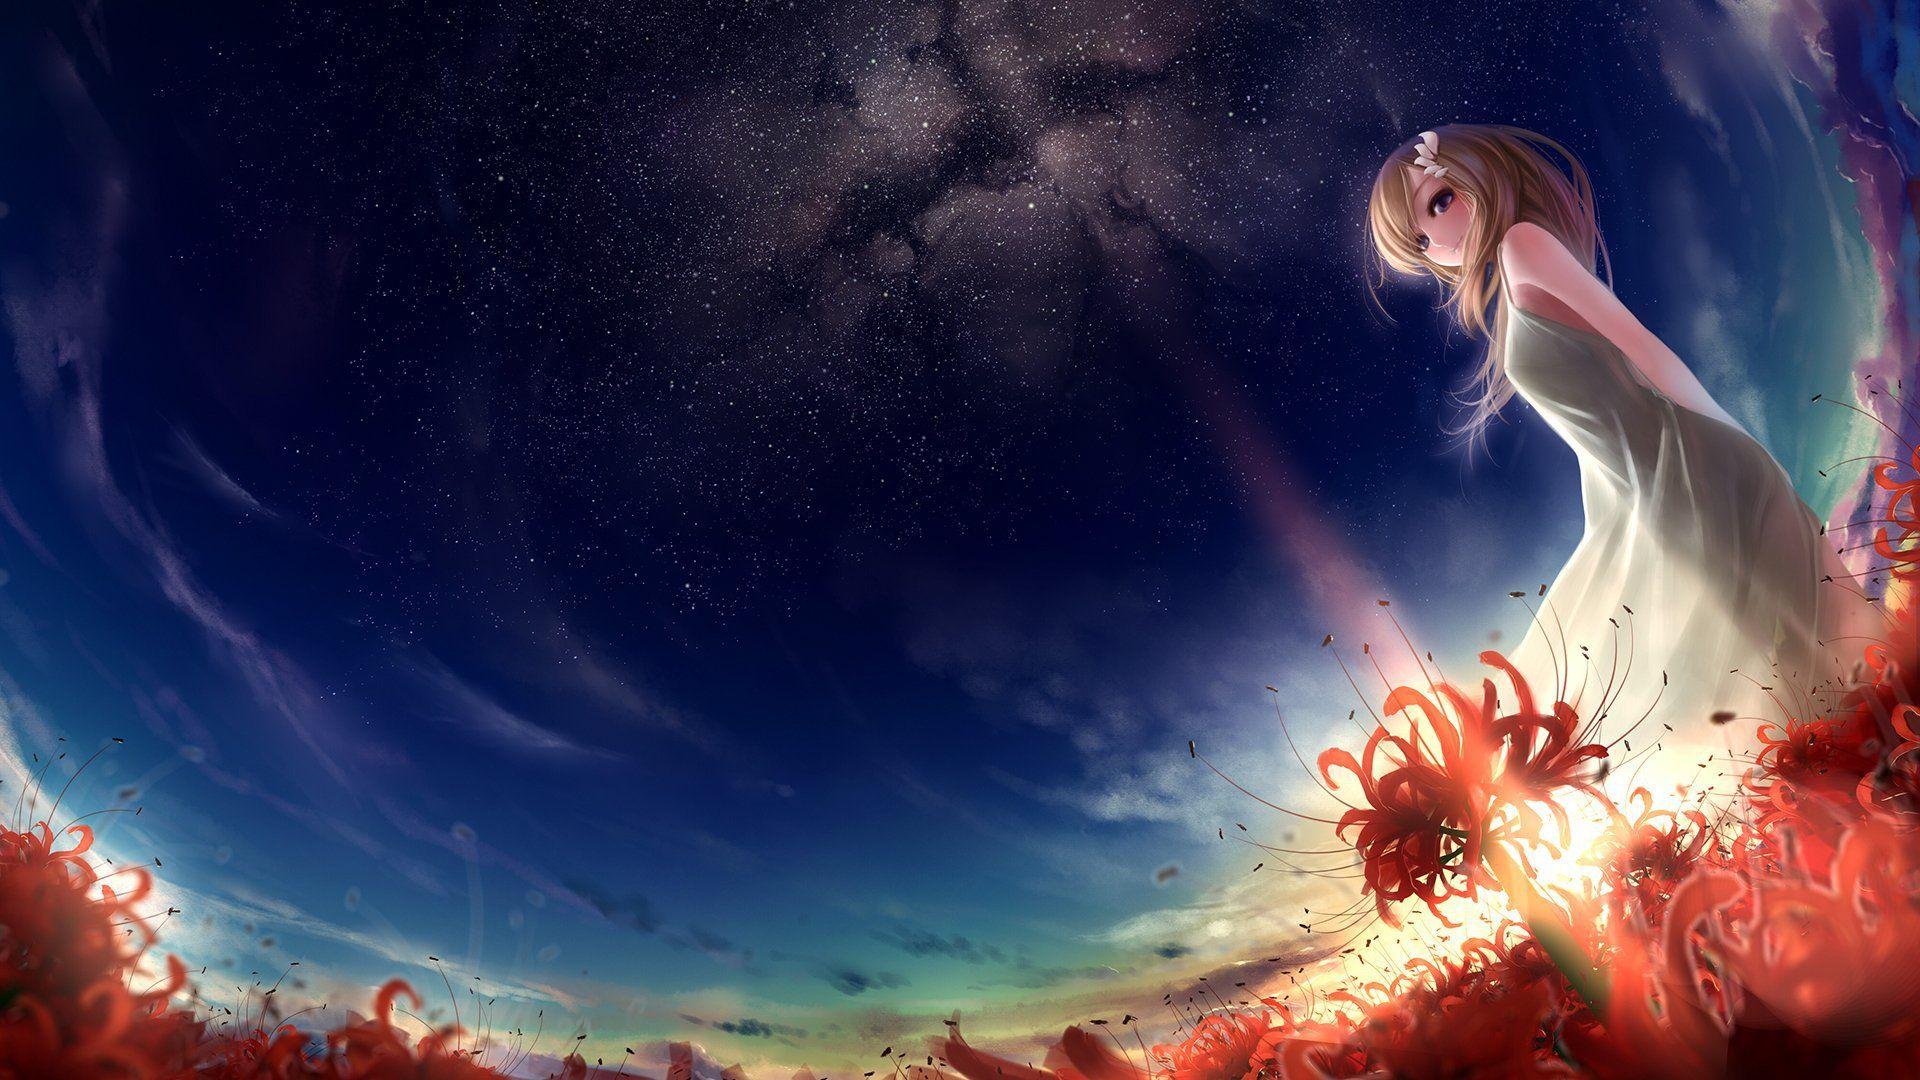 Manga Anime Wallpaper 1 Hd Art Epic Heroes Video Gallery Cool